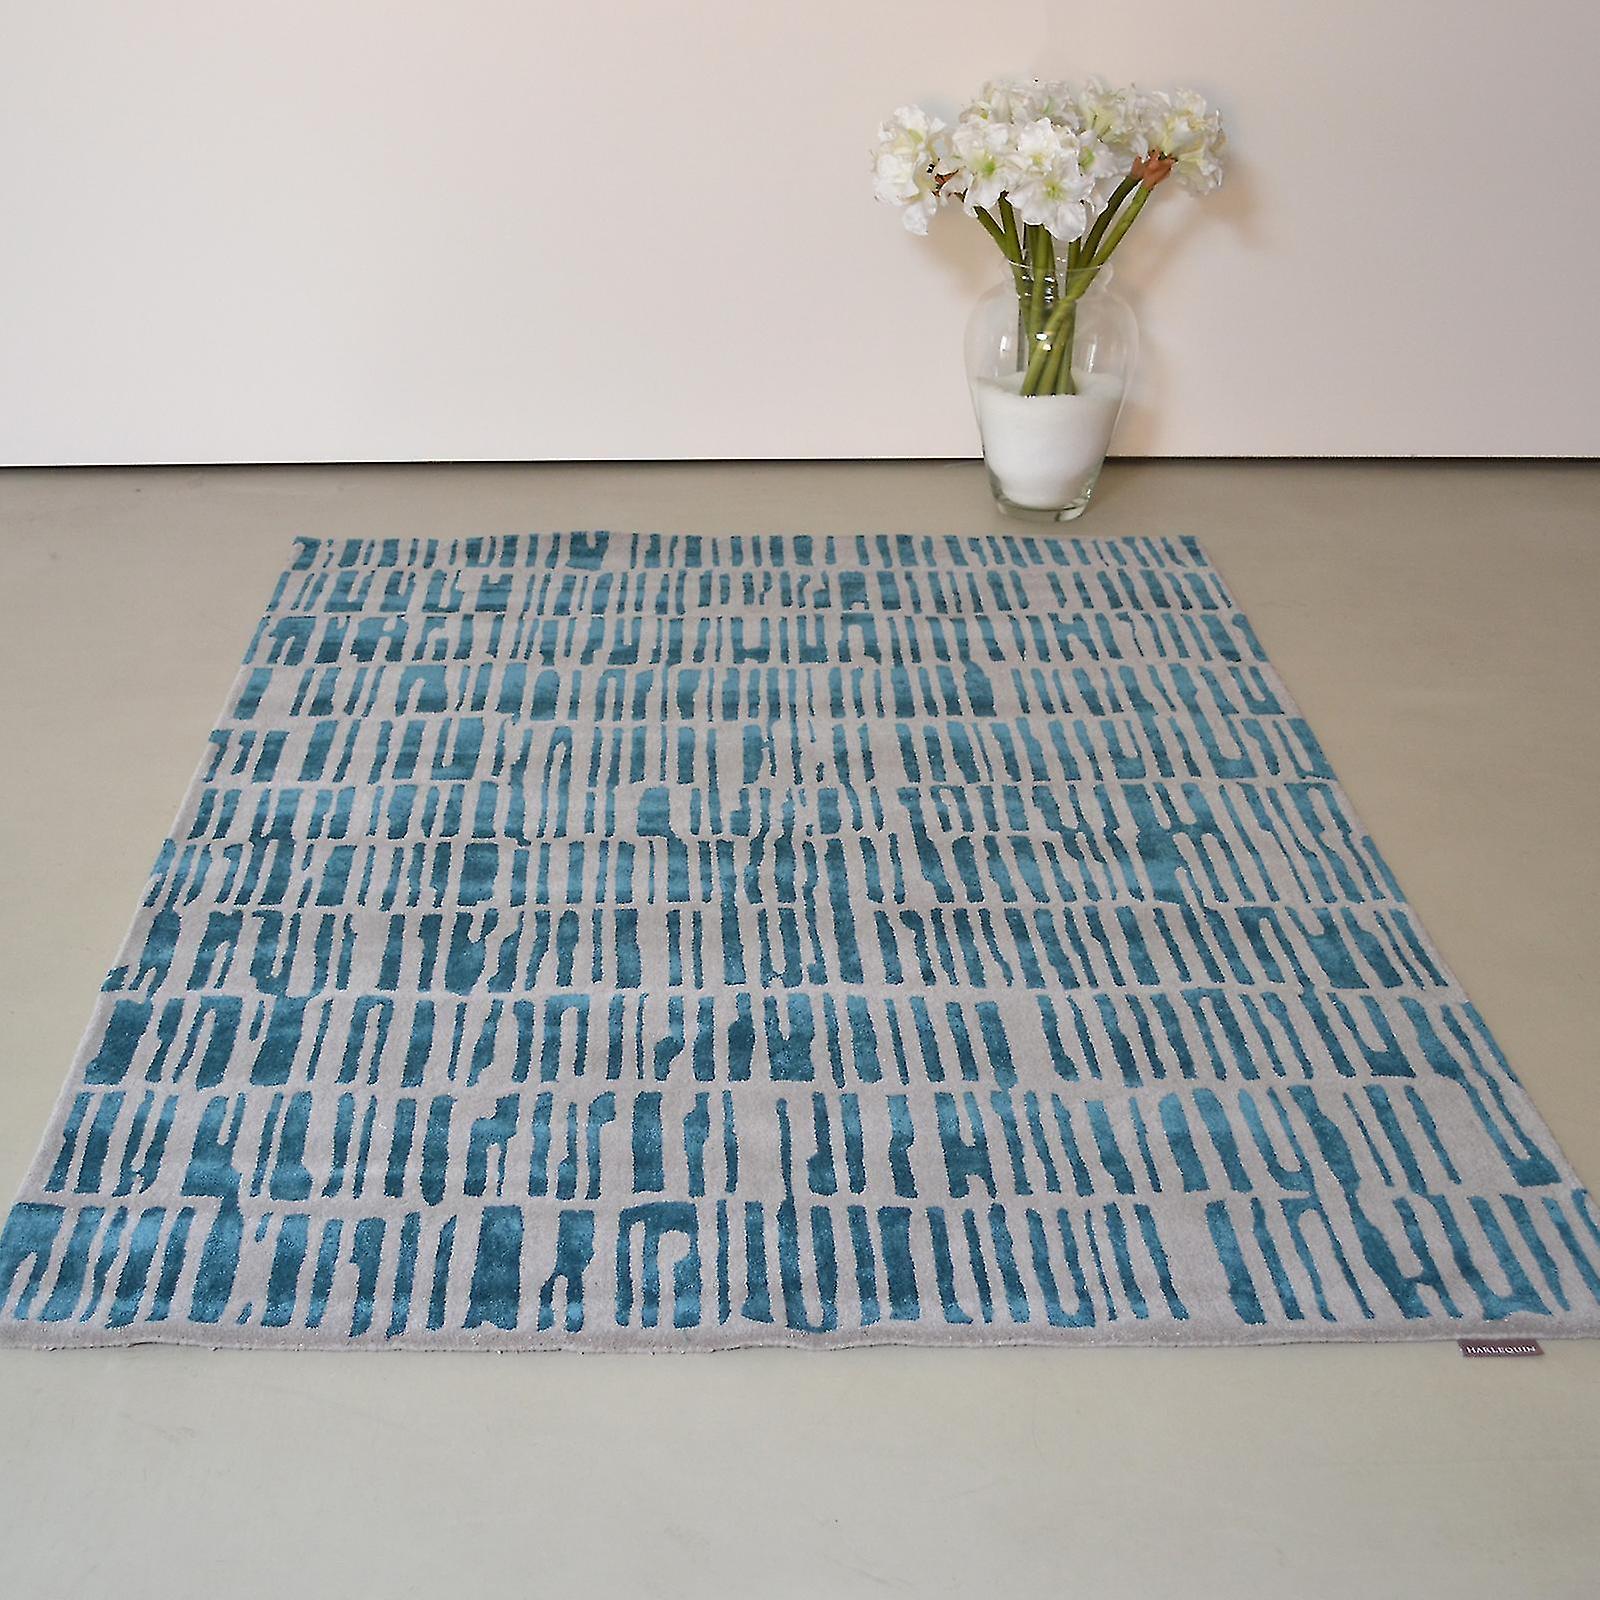 Skintilla tapis à Kingfisher 41707 par Arlequin